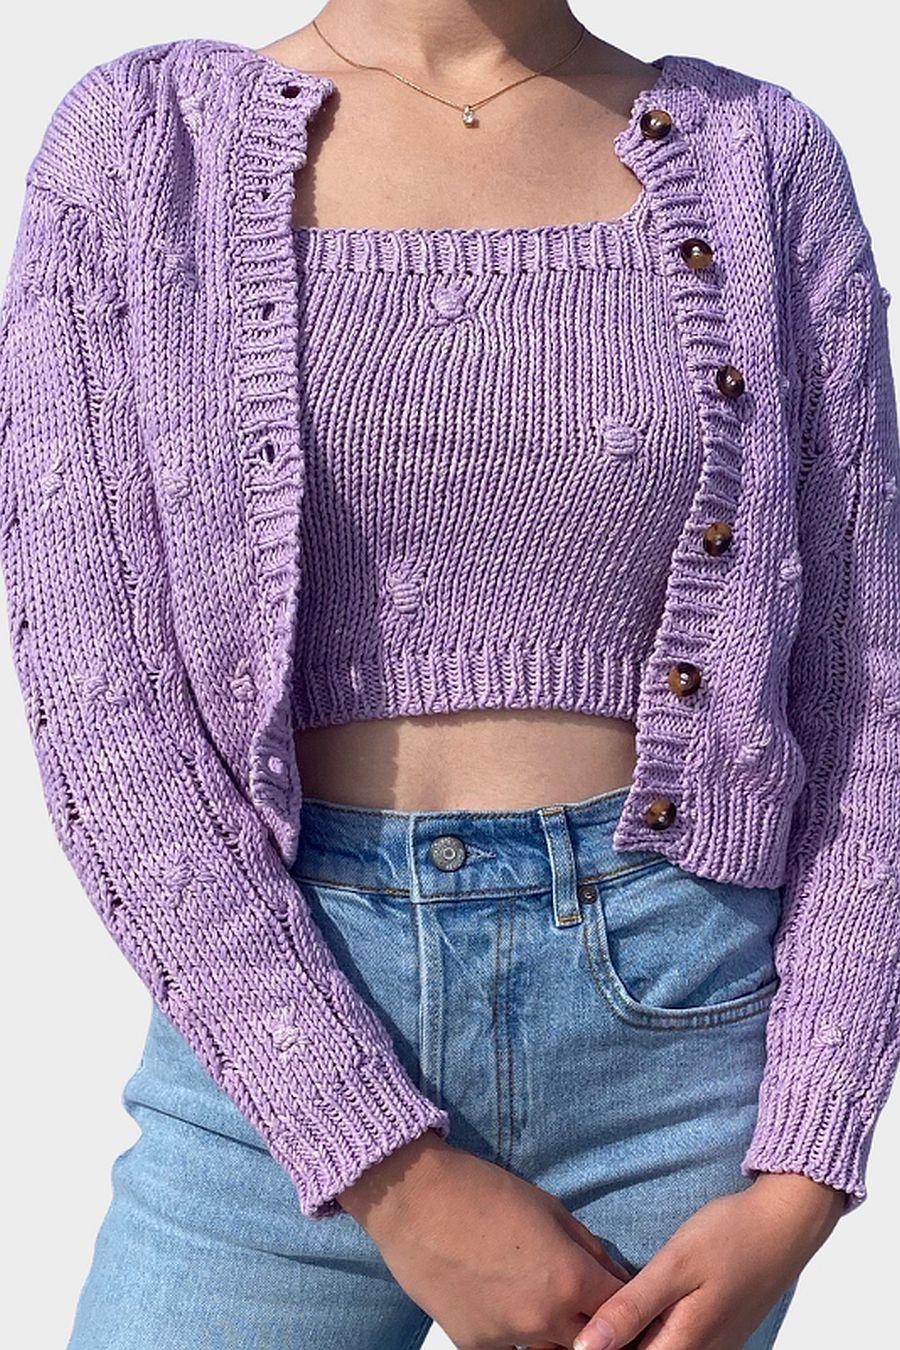 Tach Clothing Juno Knit Cardi